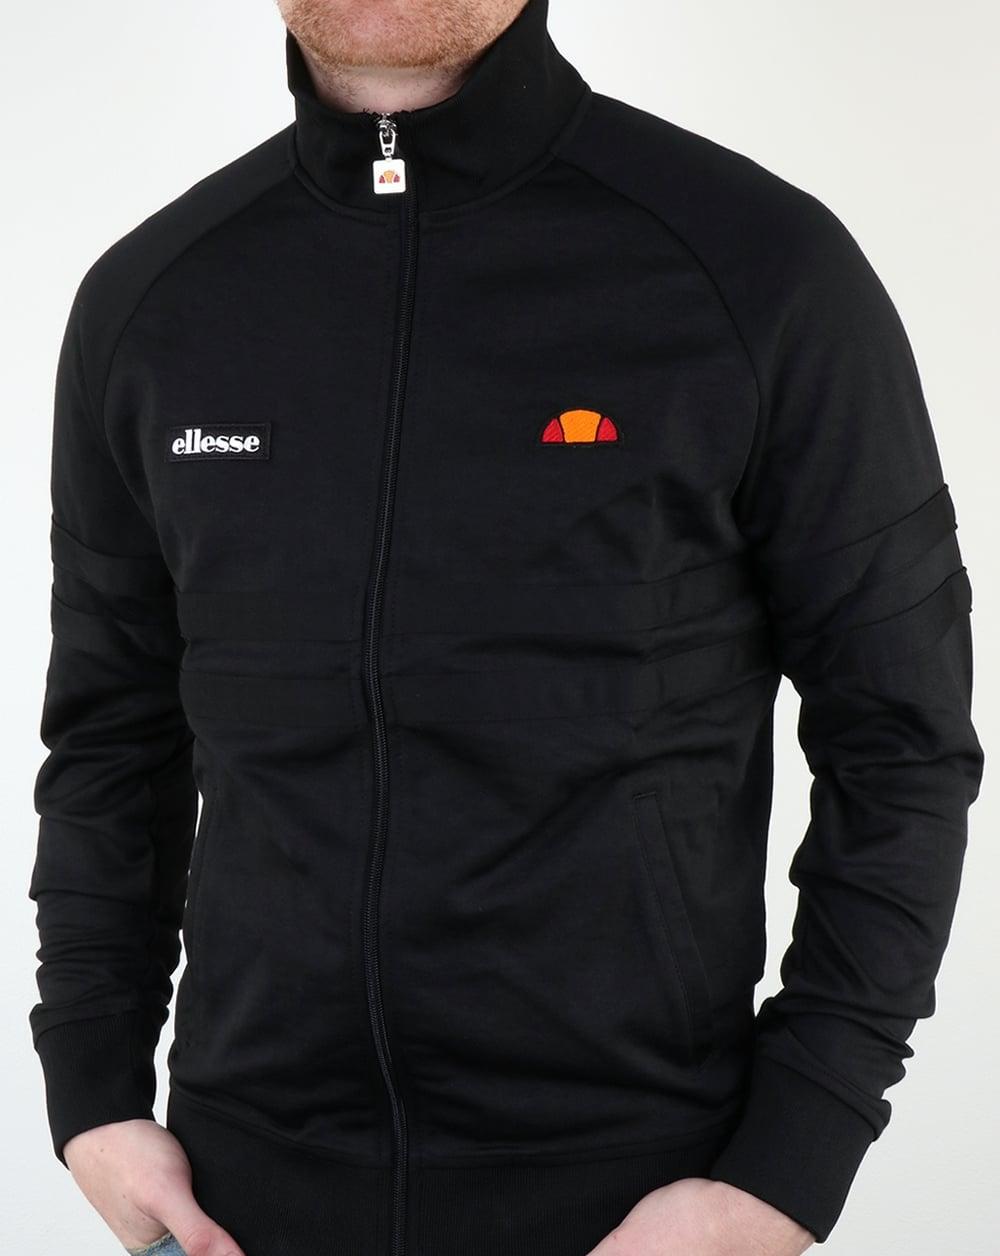 Ellesse Rimini Track Top Black Black Tracksuit Jacket Mens